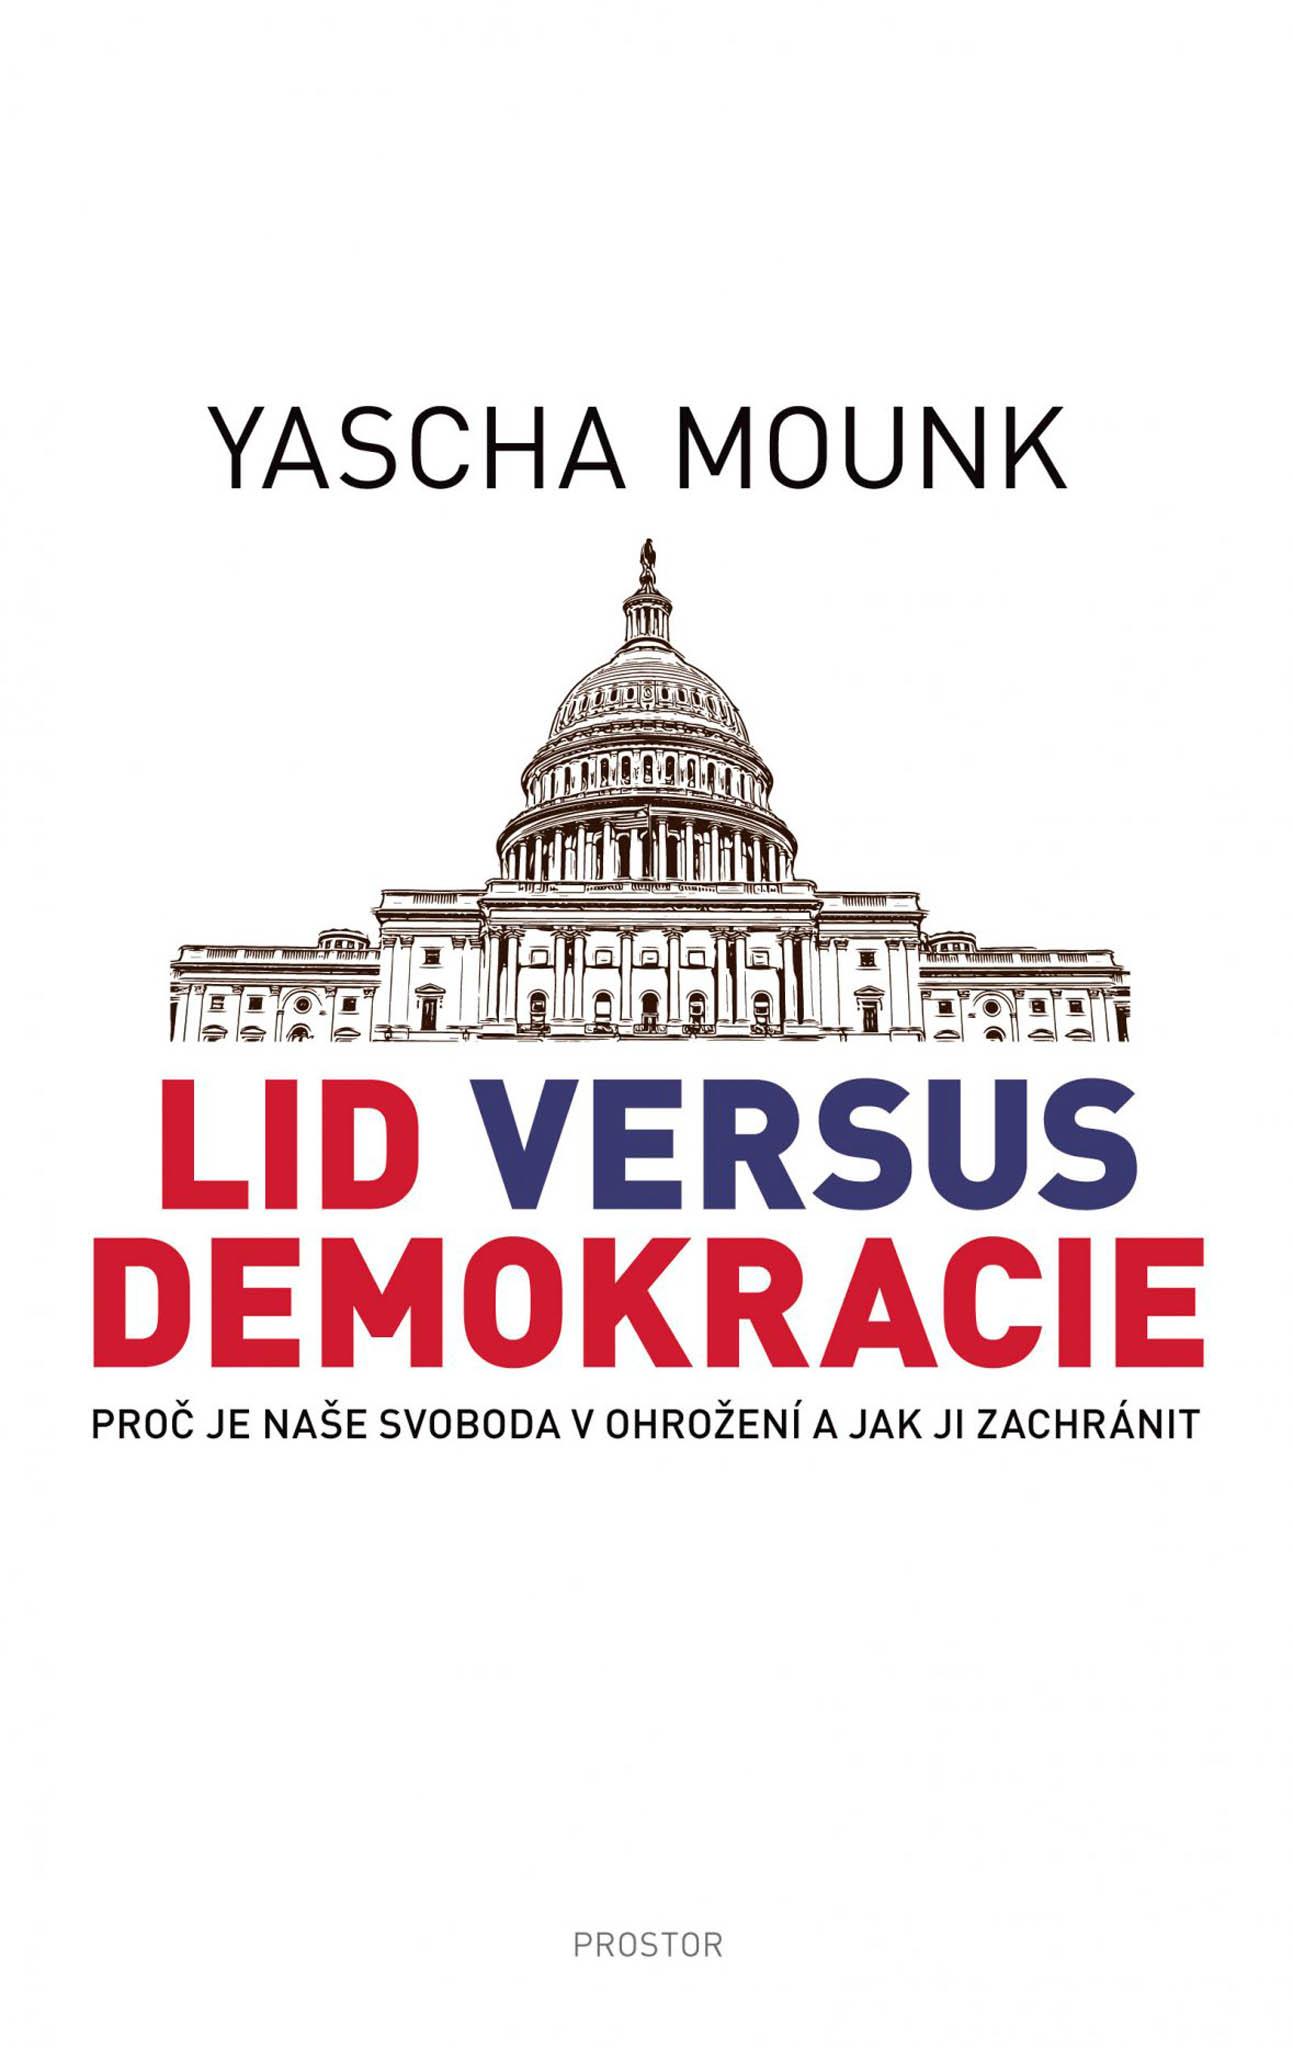 Yascha Mounk: Lid versus demokracie, Prostor, 2019